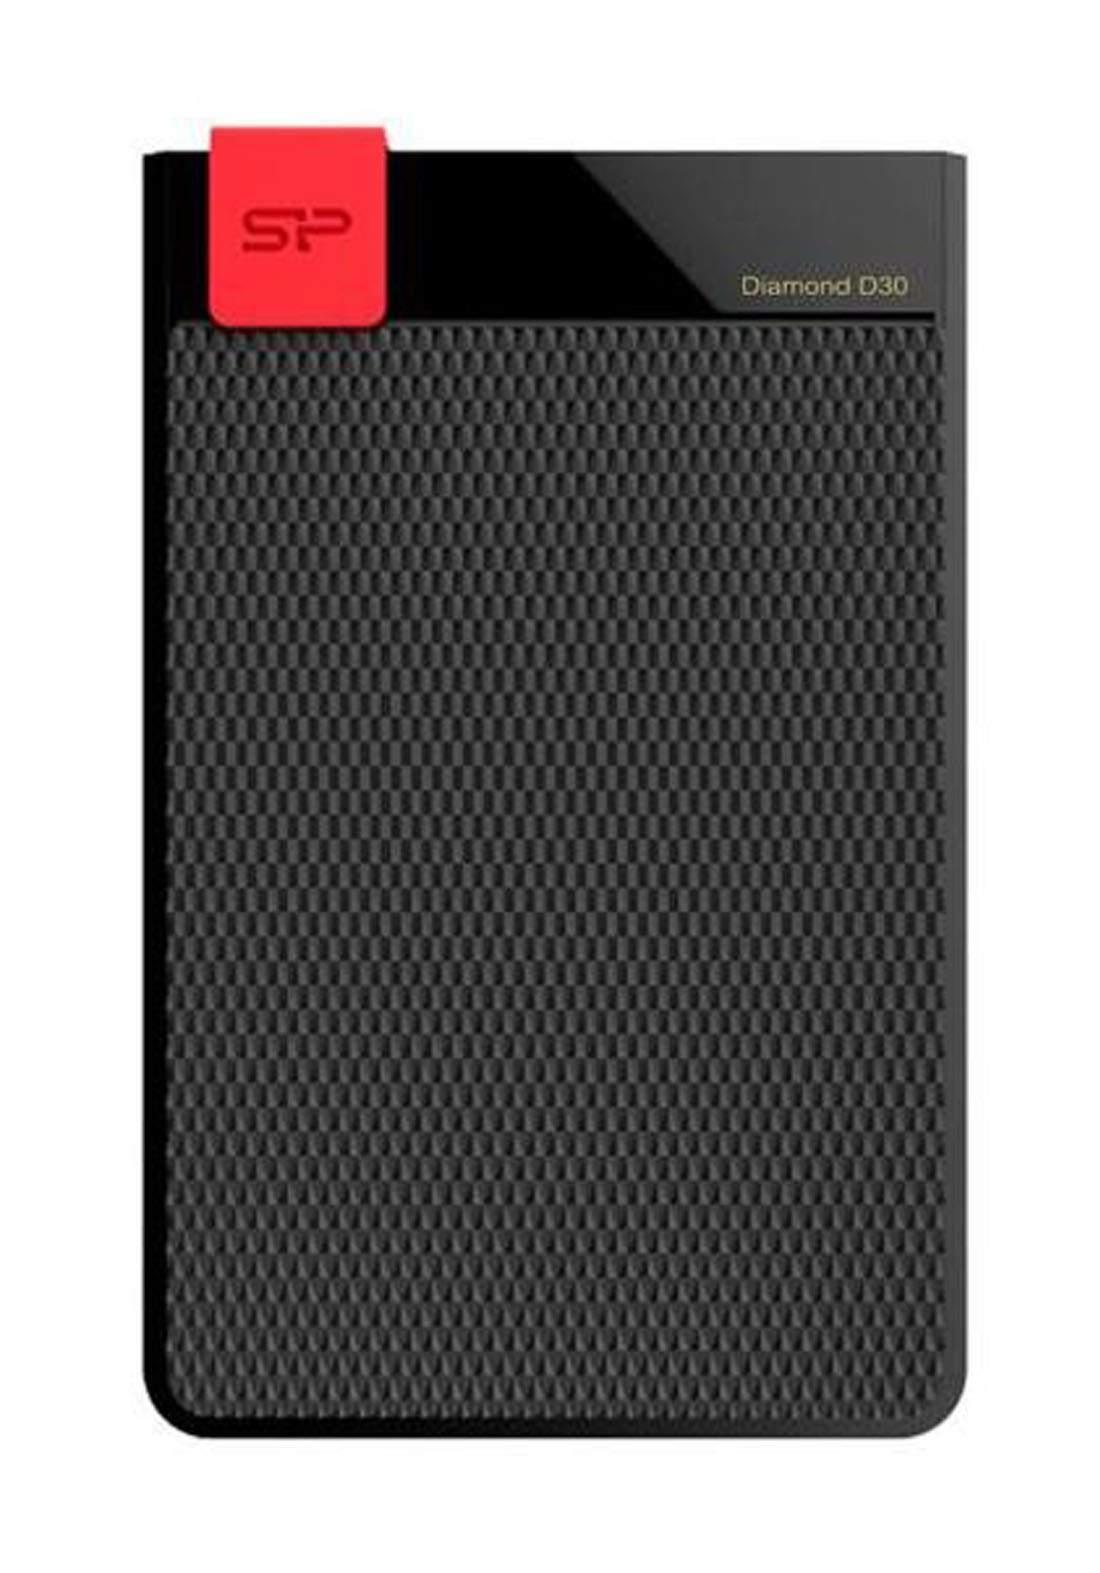 Silicon Power Diamond D30 2TB 3.1 USB Portable Hard Drive - Black هارد خارجي